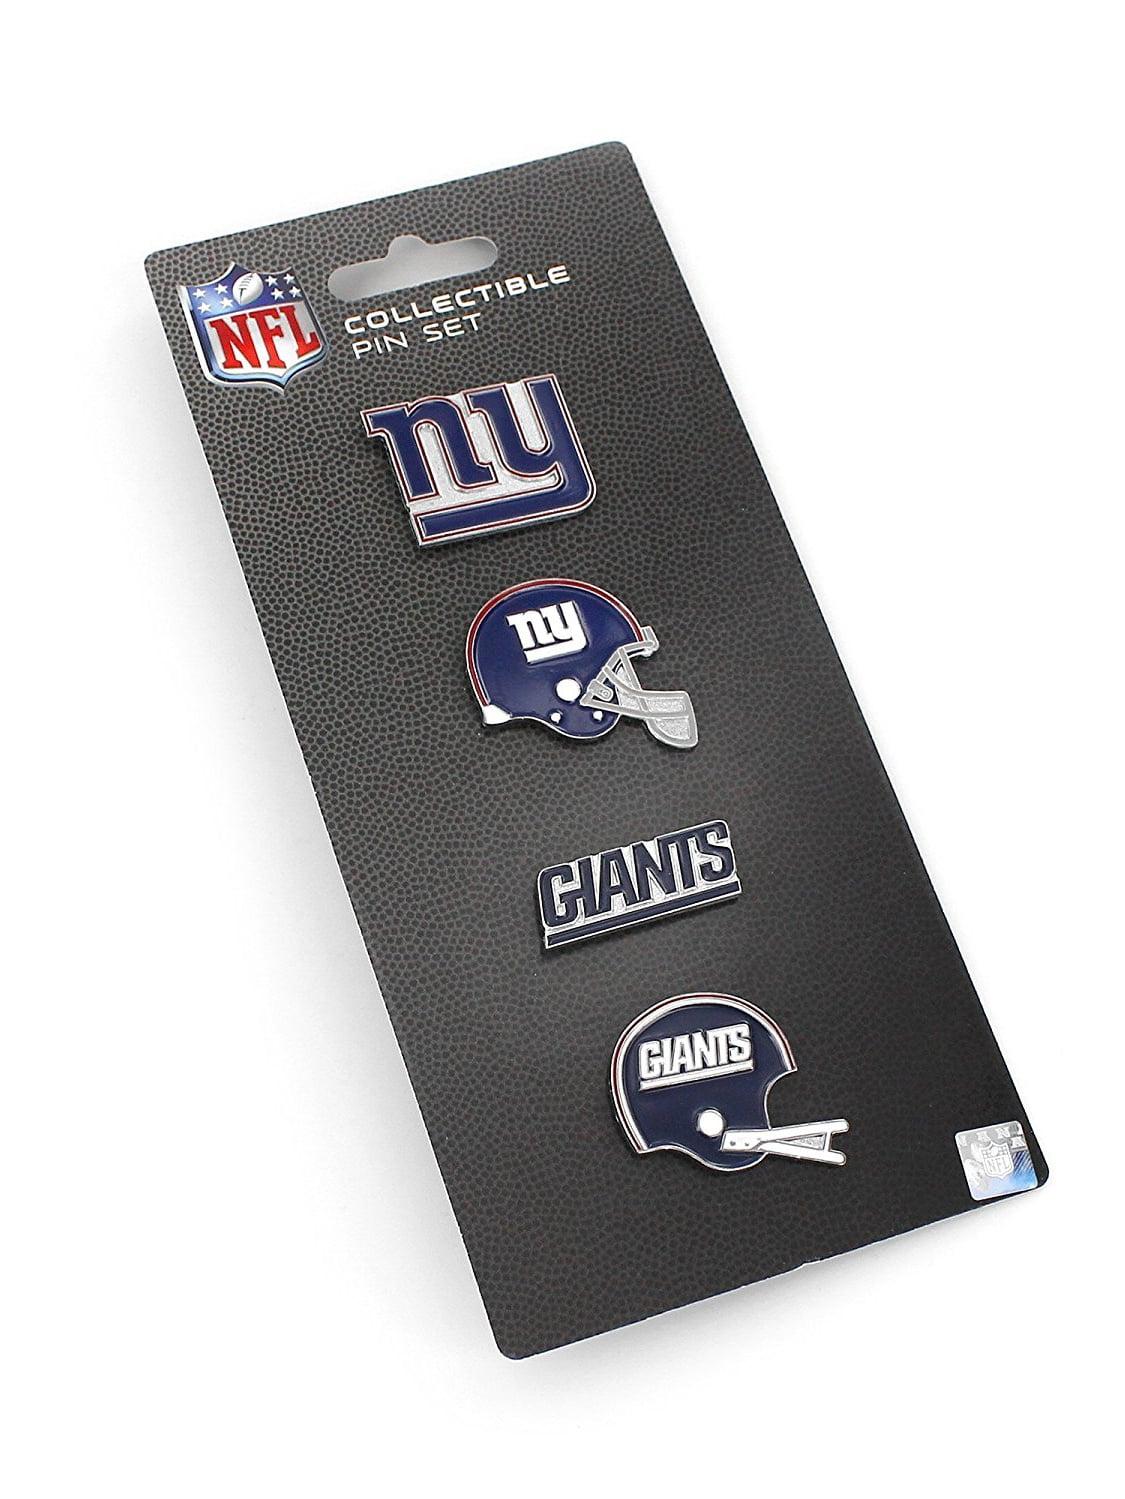 NFL New York Giants Logo Evolution 4 Pin Set, Royal Blue, Red, 1 1 4-inch by Siskiyou